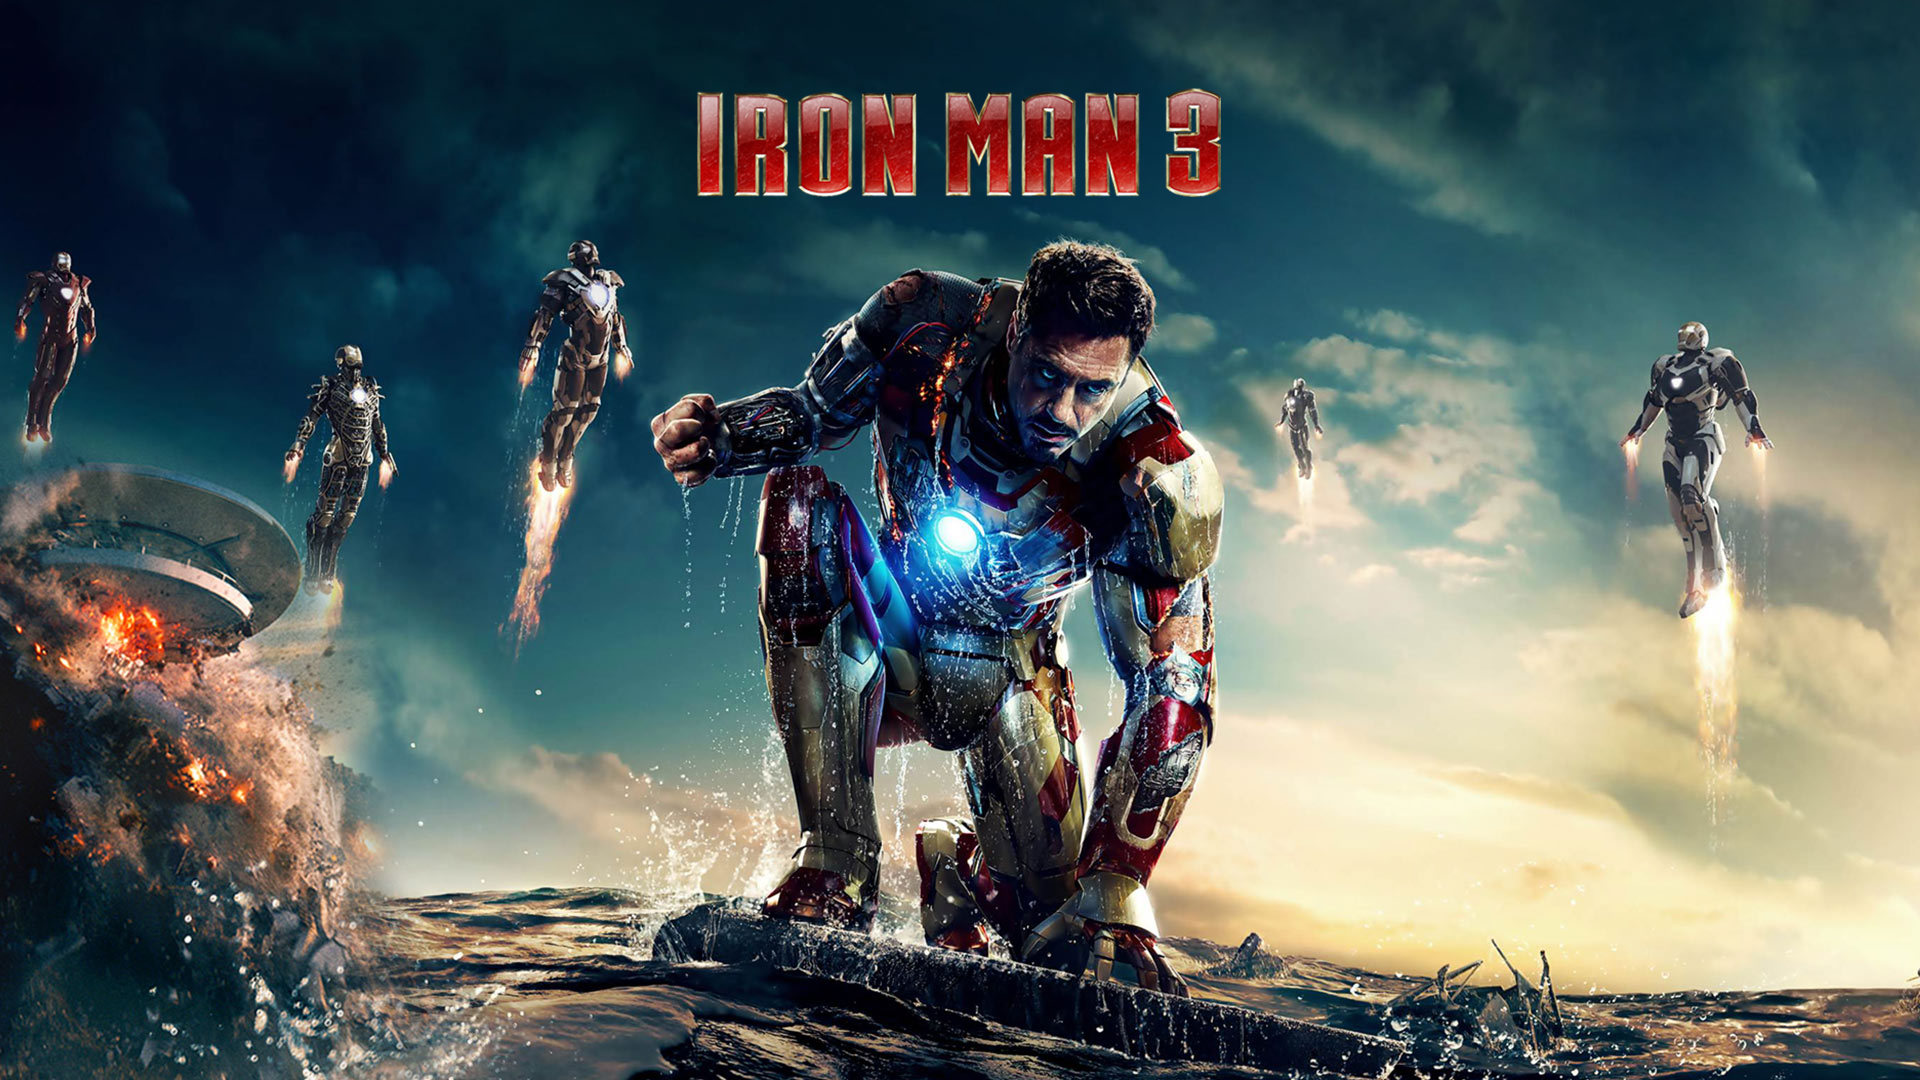 Iron Man 3 (Theatrical Version)